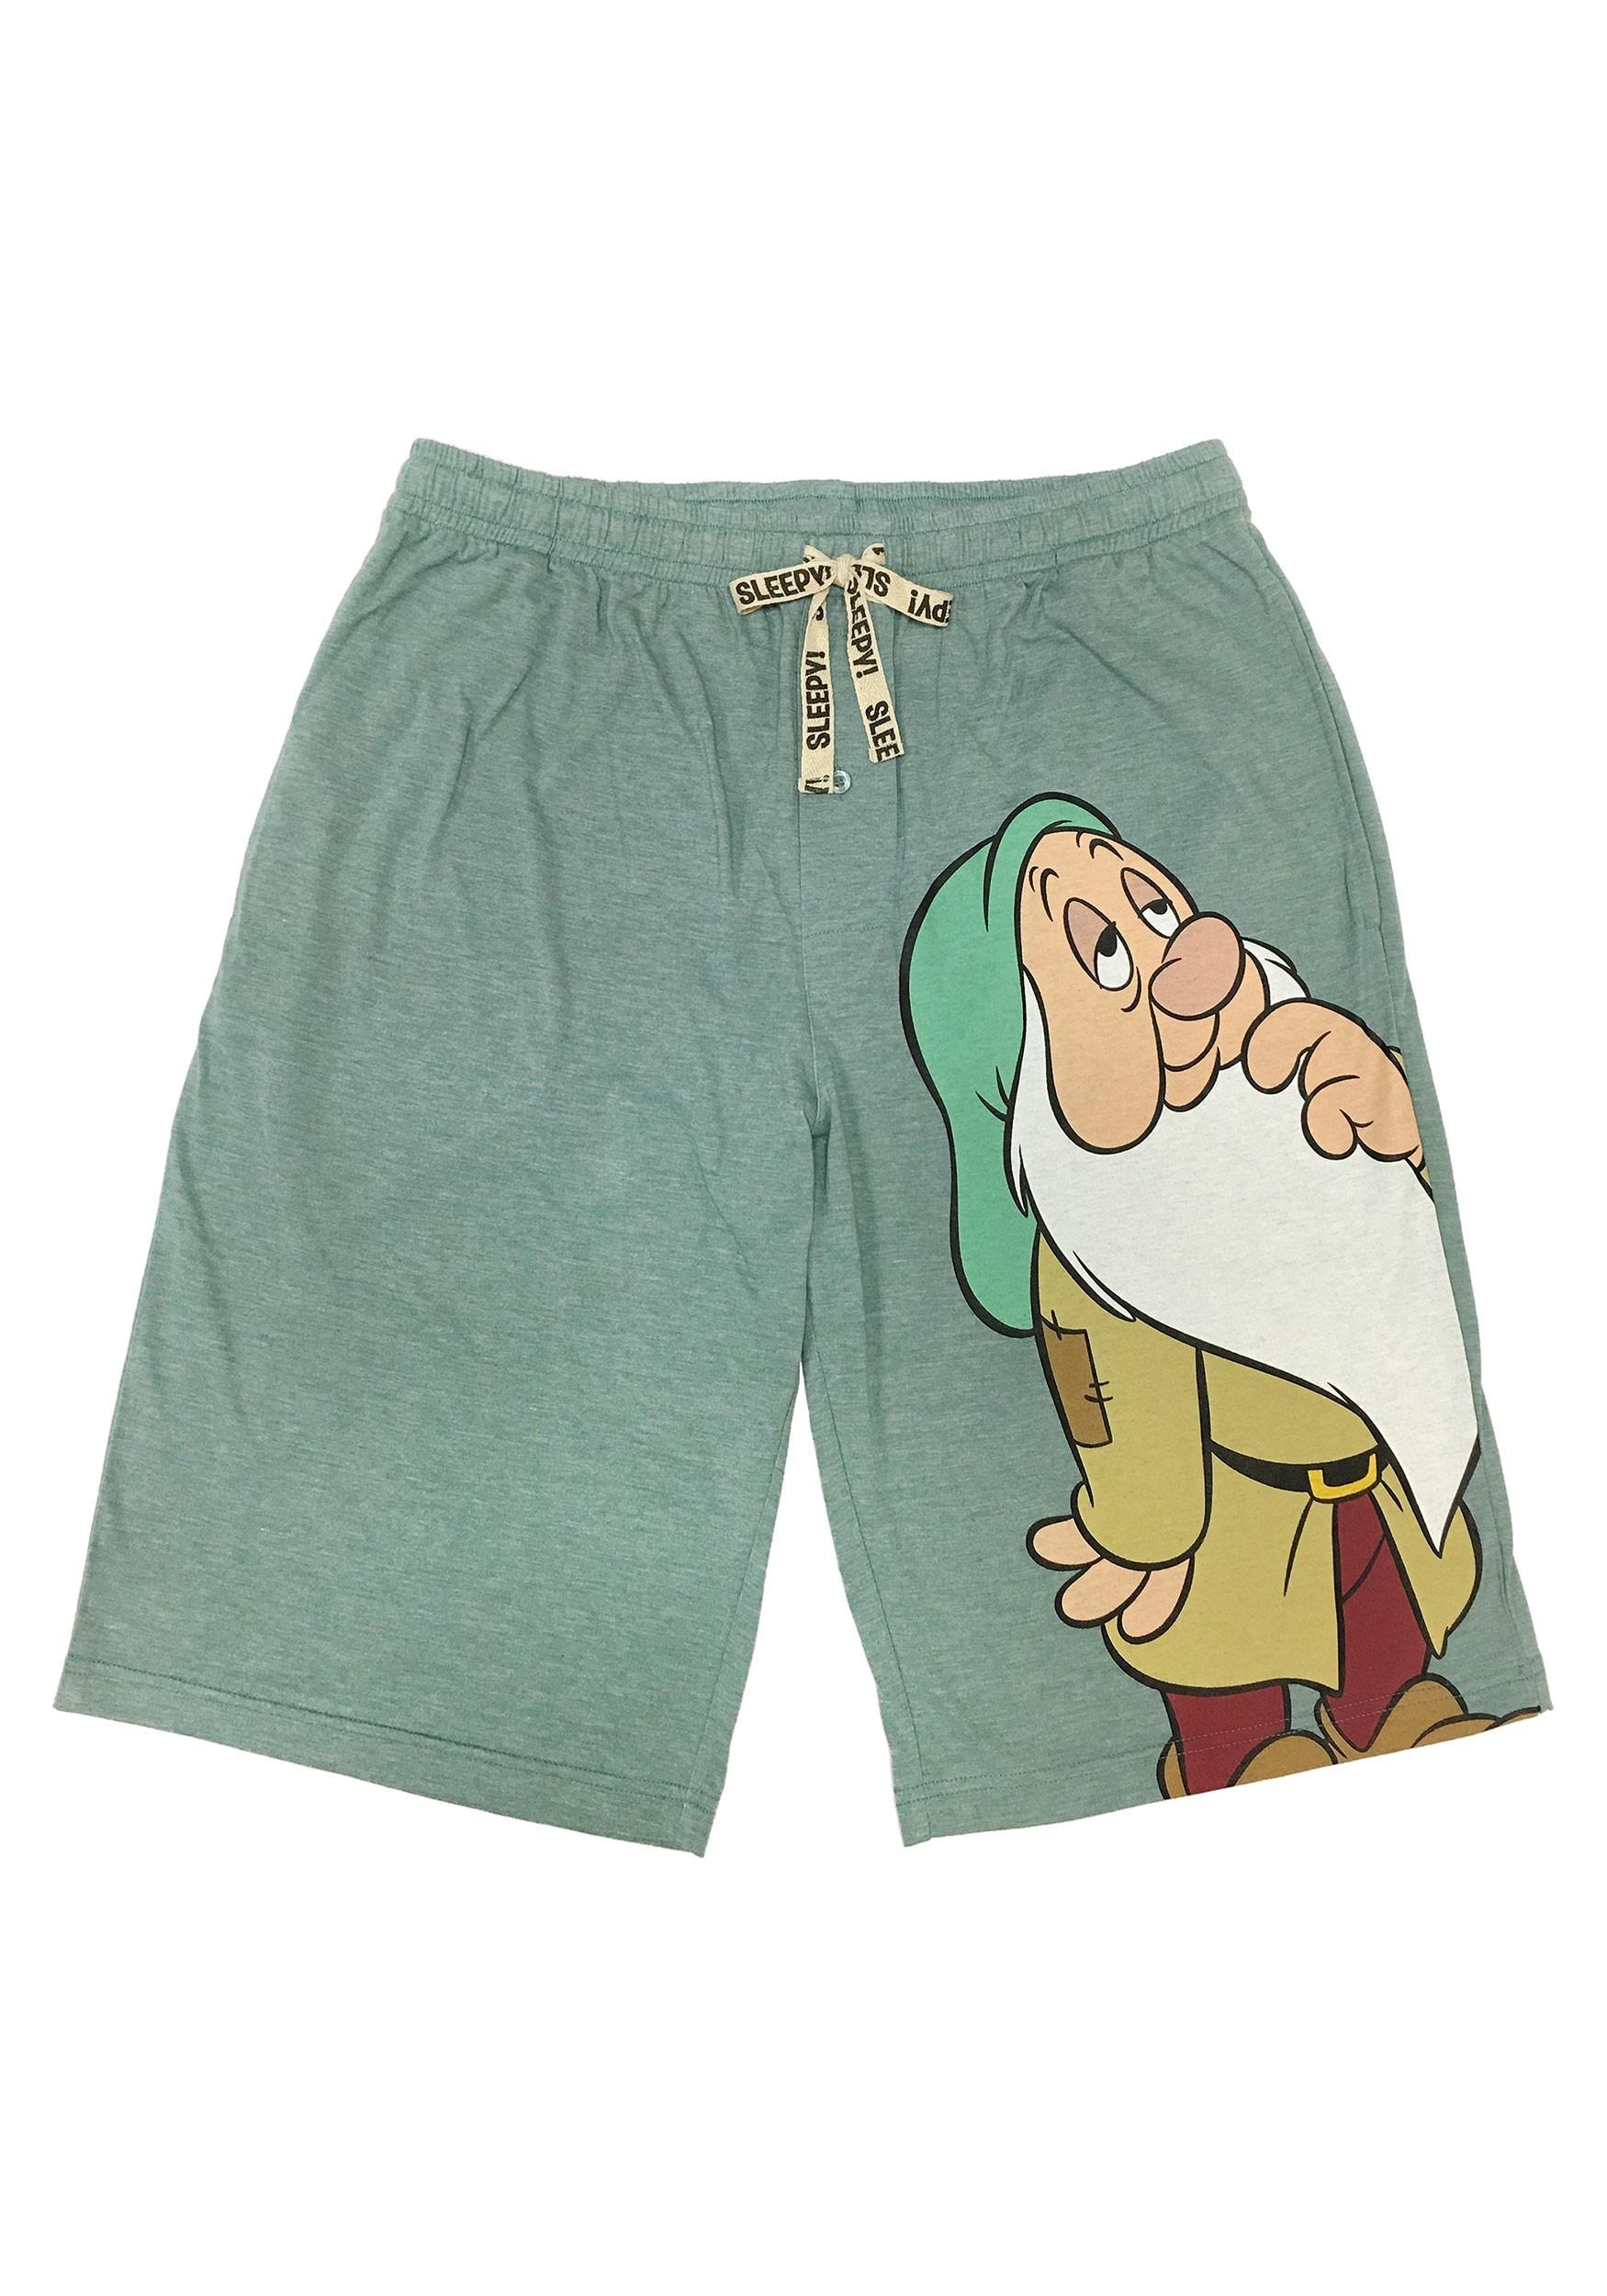 Seven Dwarfs Sleepy Drawstring Sleep Shorts for Men